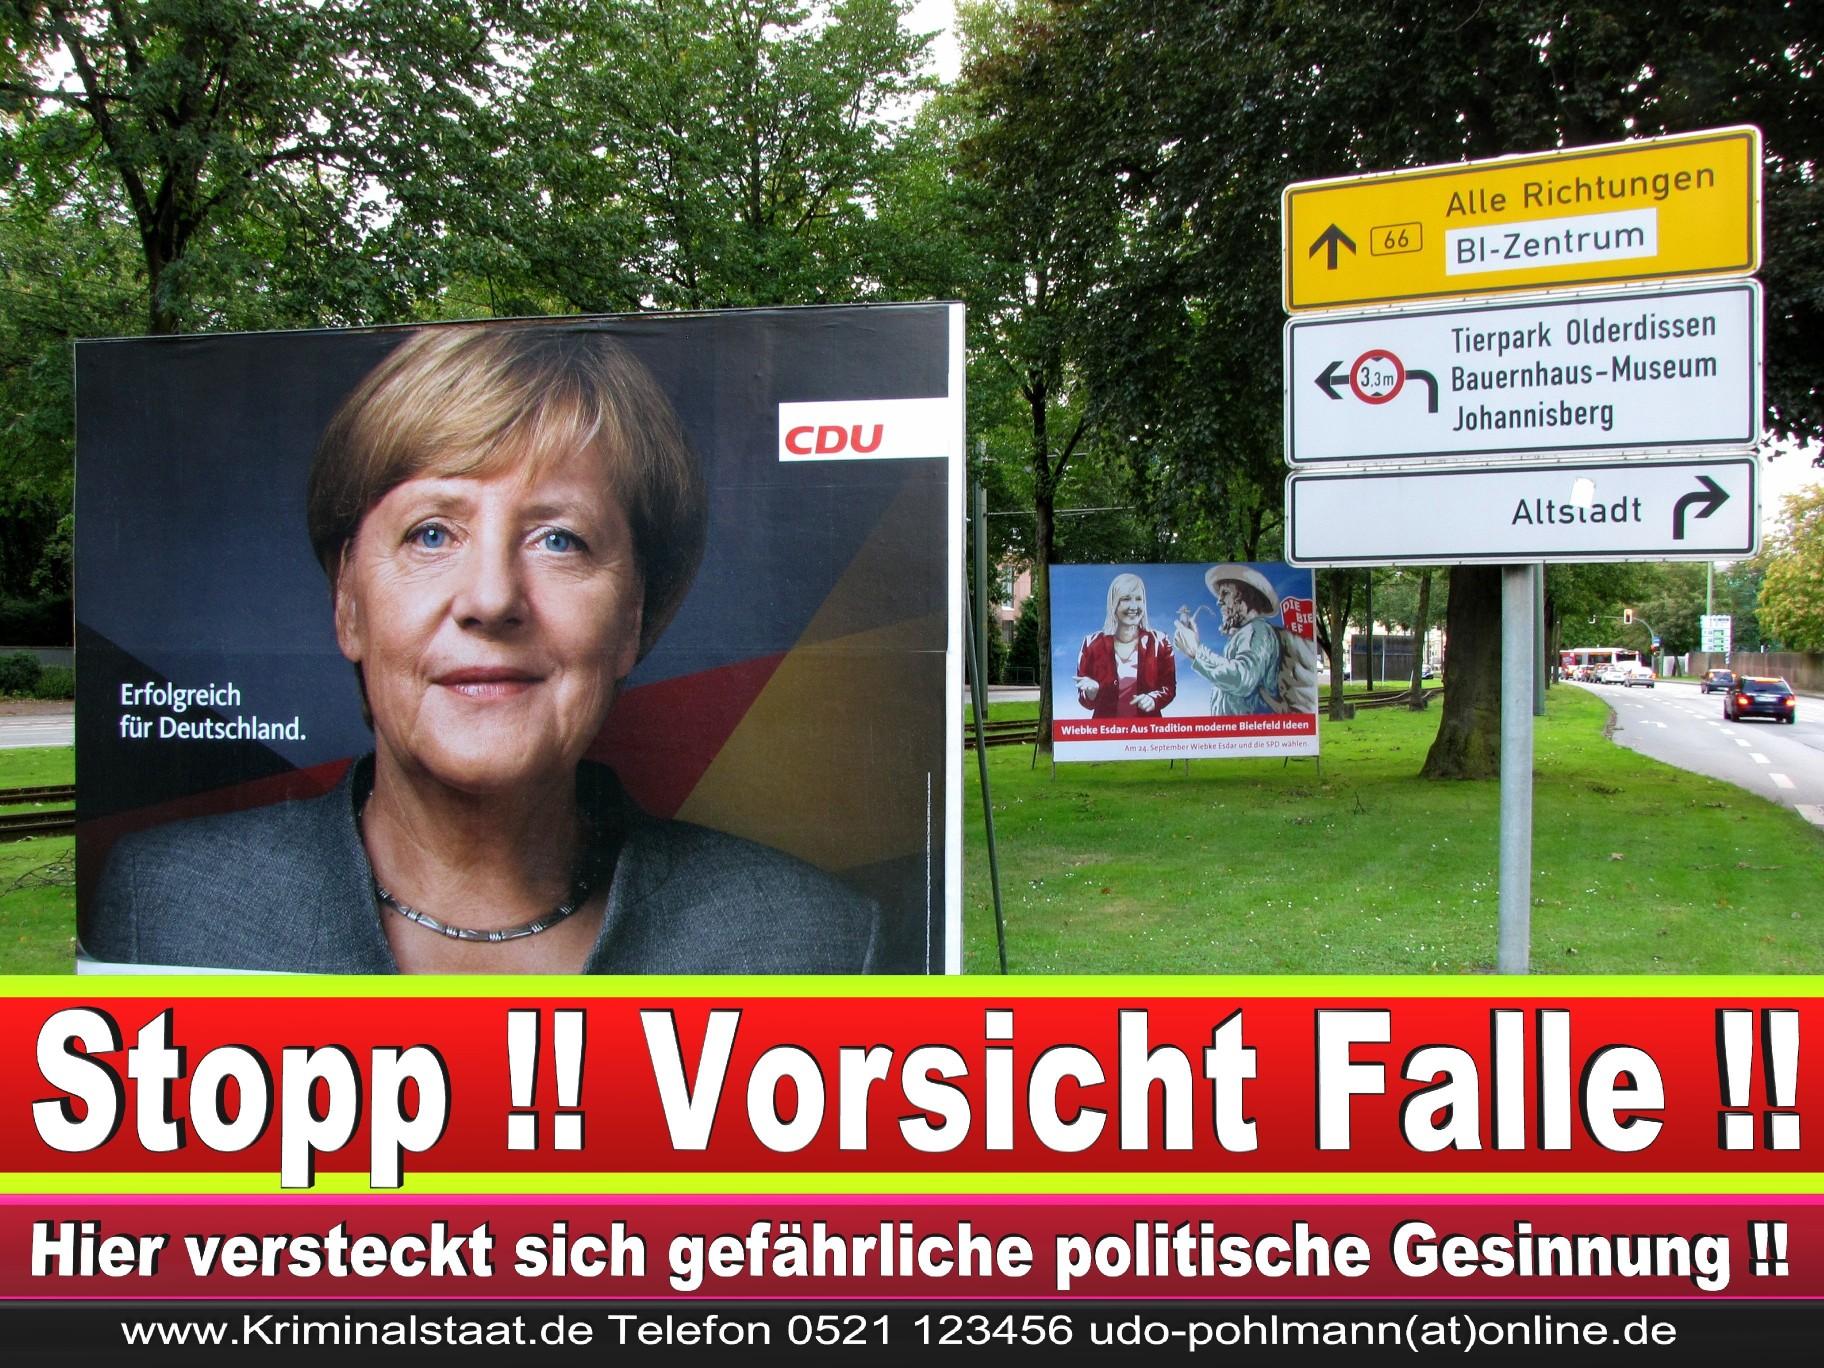 Angela Merkel Wahlplakat Wahlwerbung Bielefeld Volksverhetzung Durch Religion 5